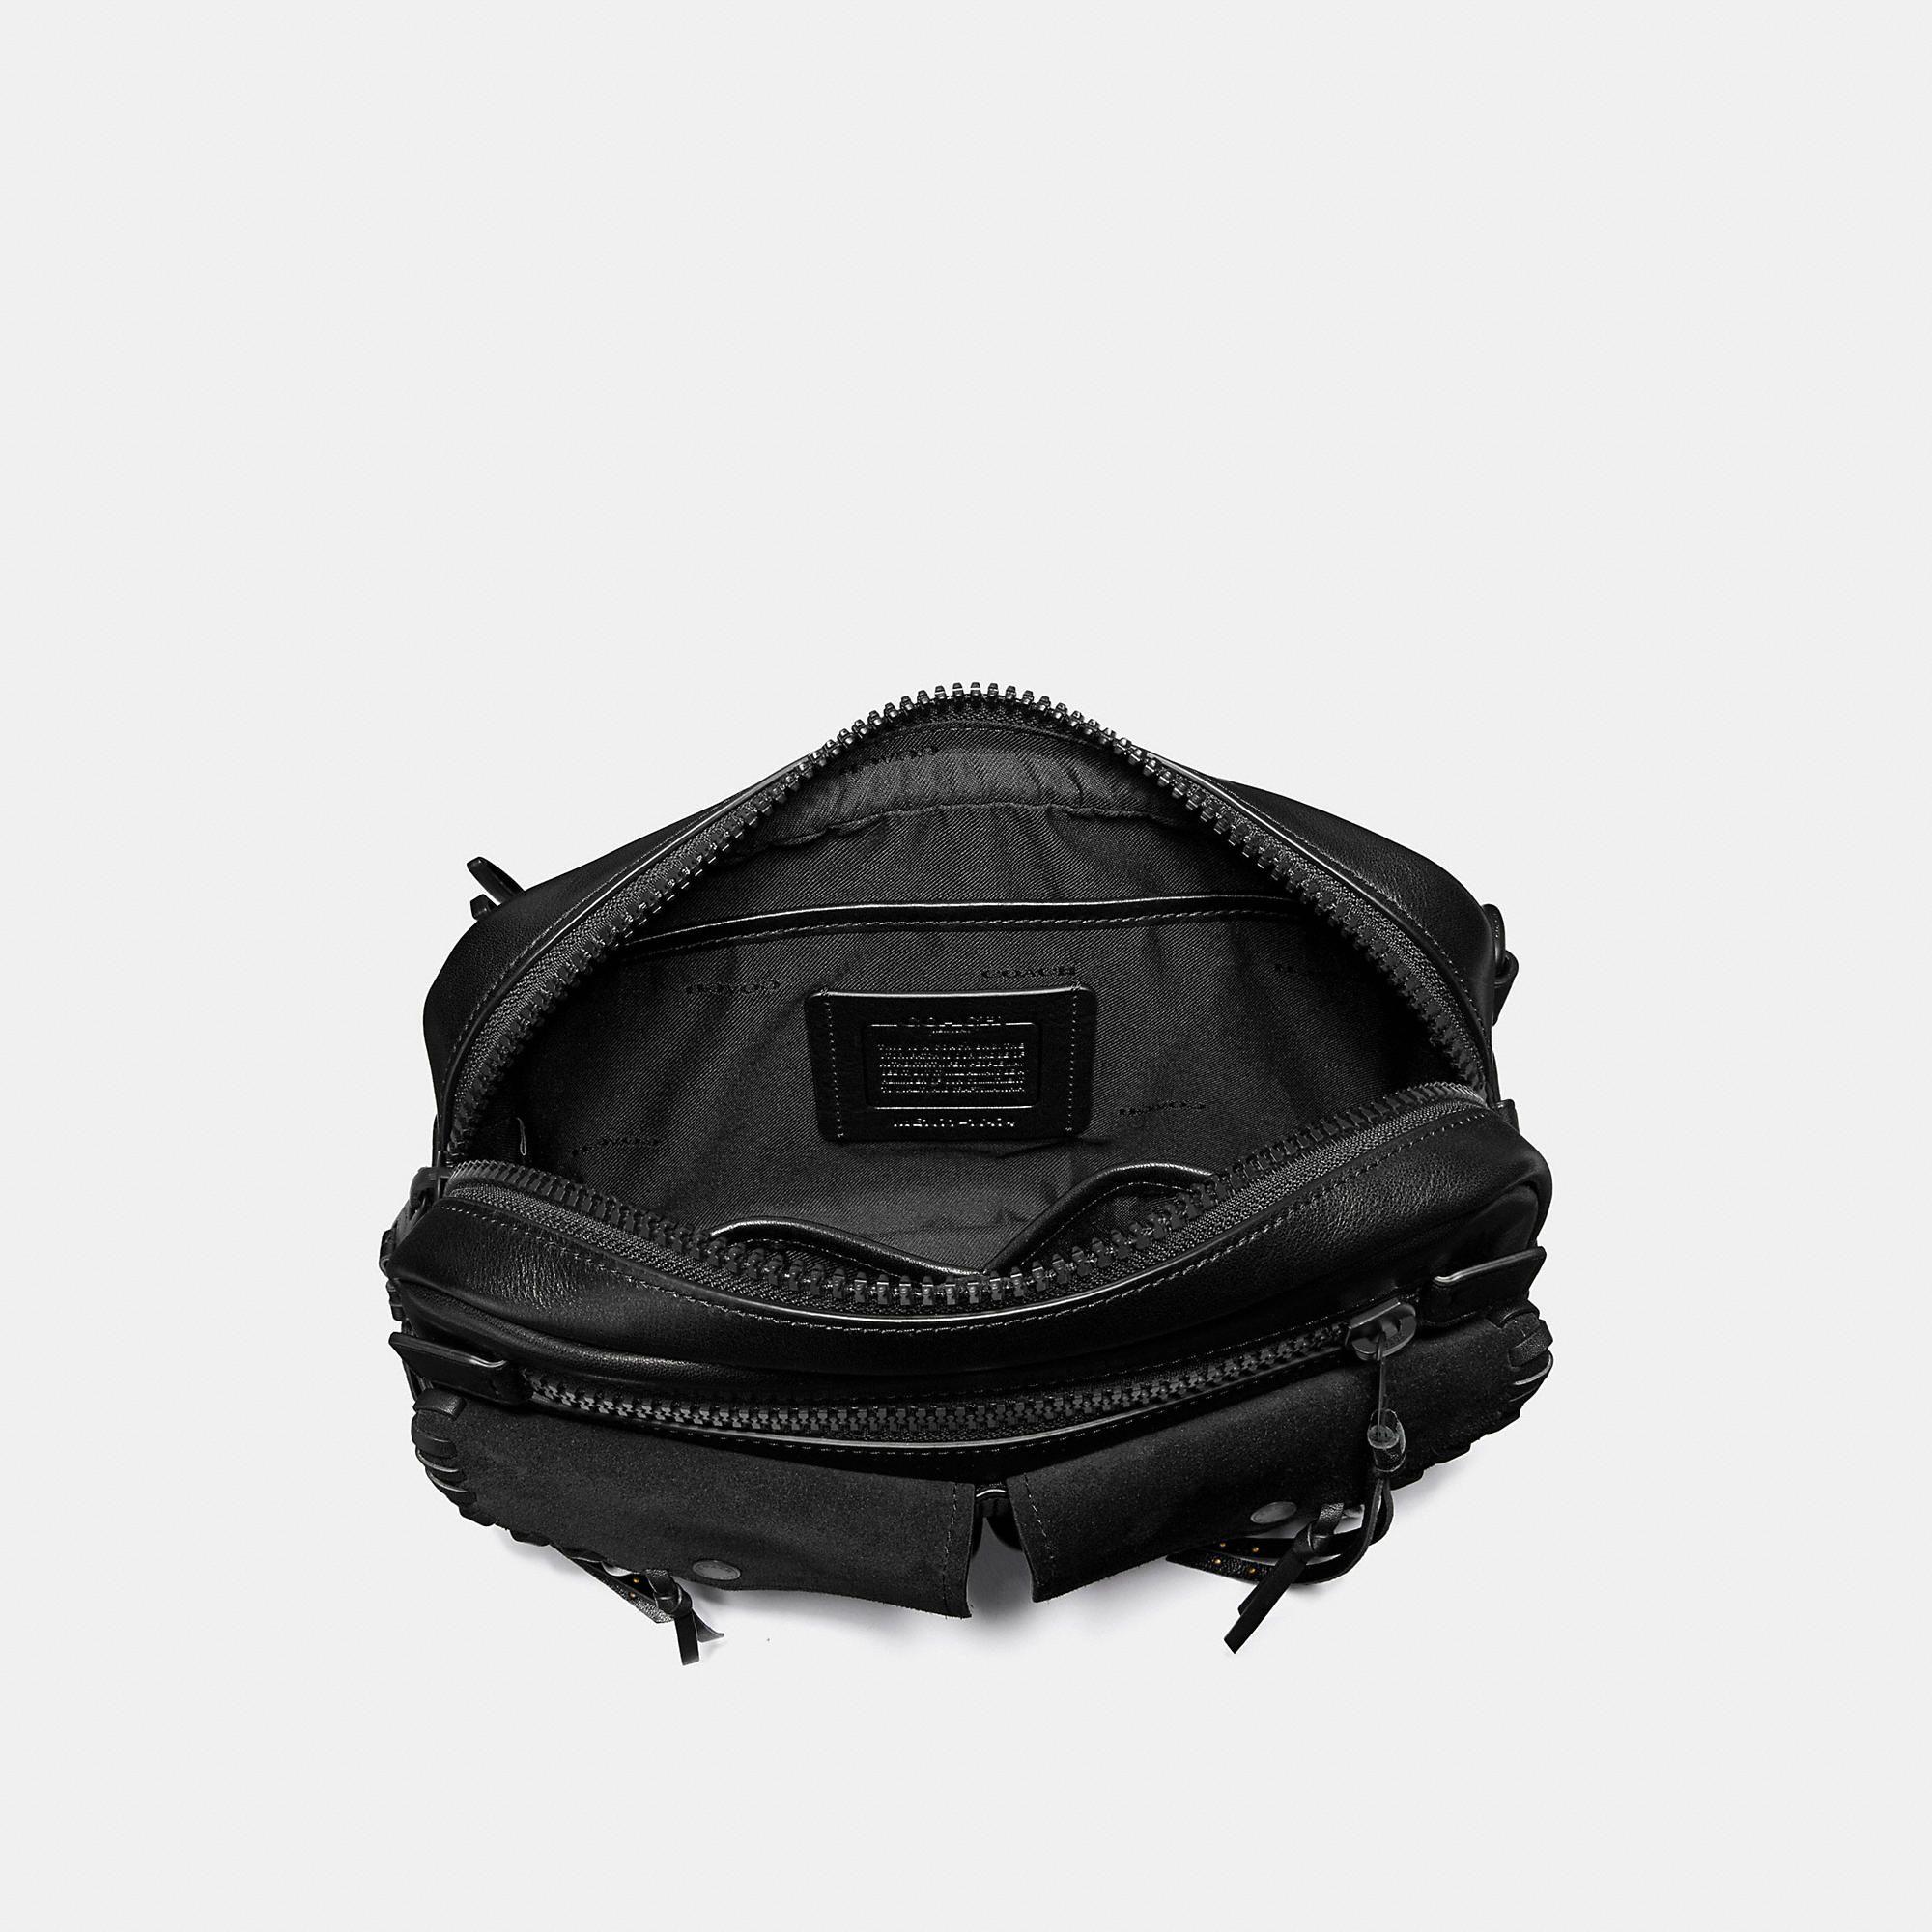 2f197a286133f COACH Men's Utility Belt Bag 25 Messenger Bags | Products | Mens ...